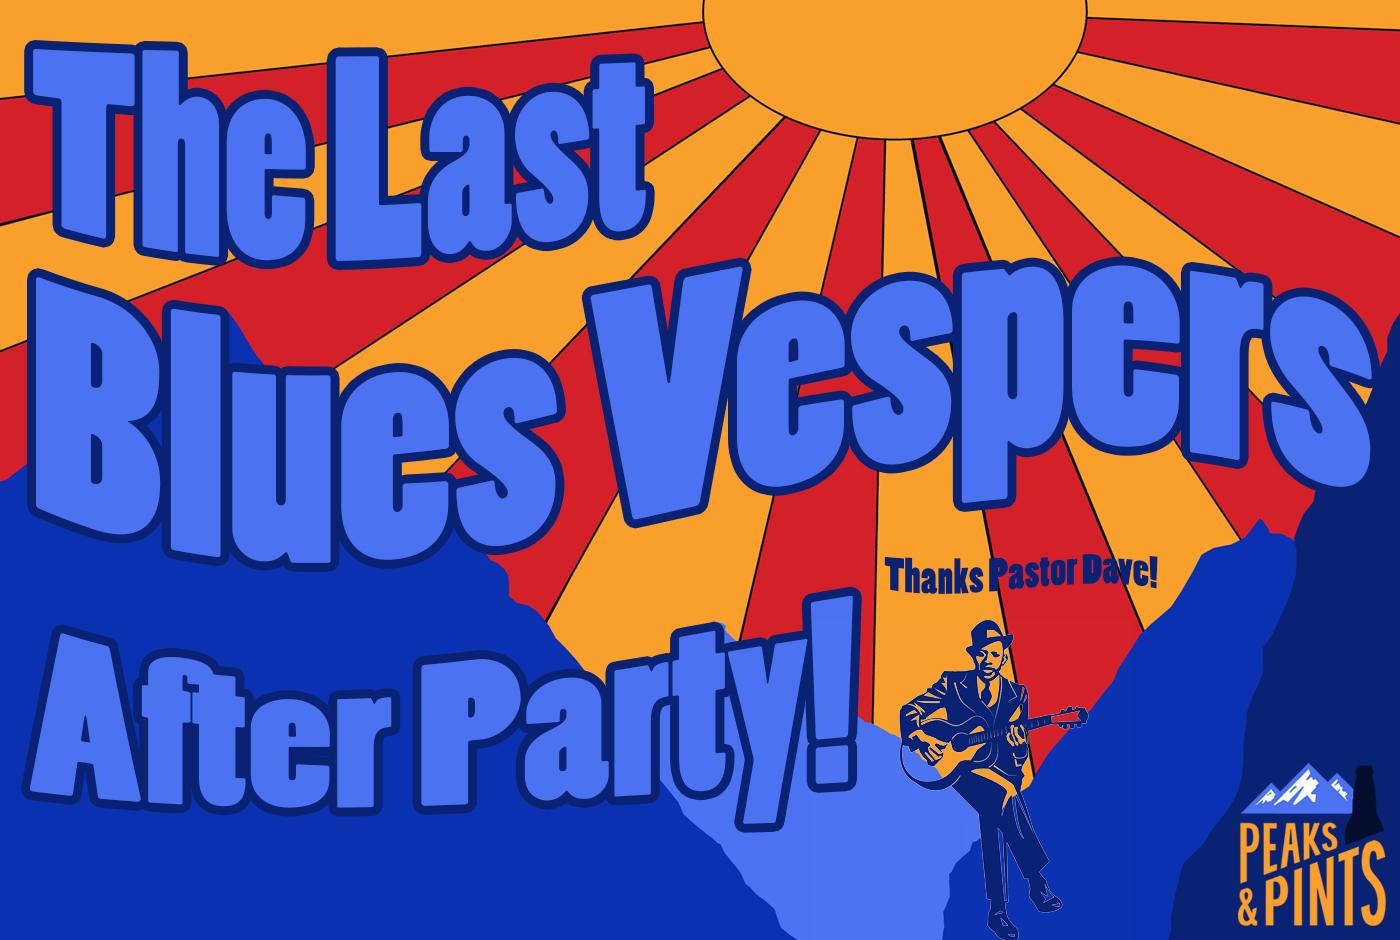 The-Last-Blues-Vespers-After-Party-calendar